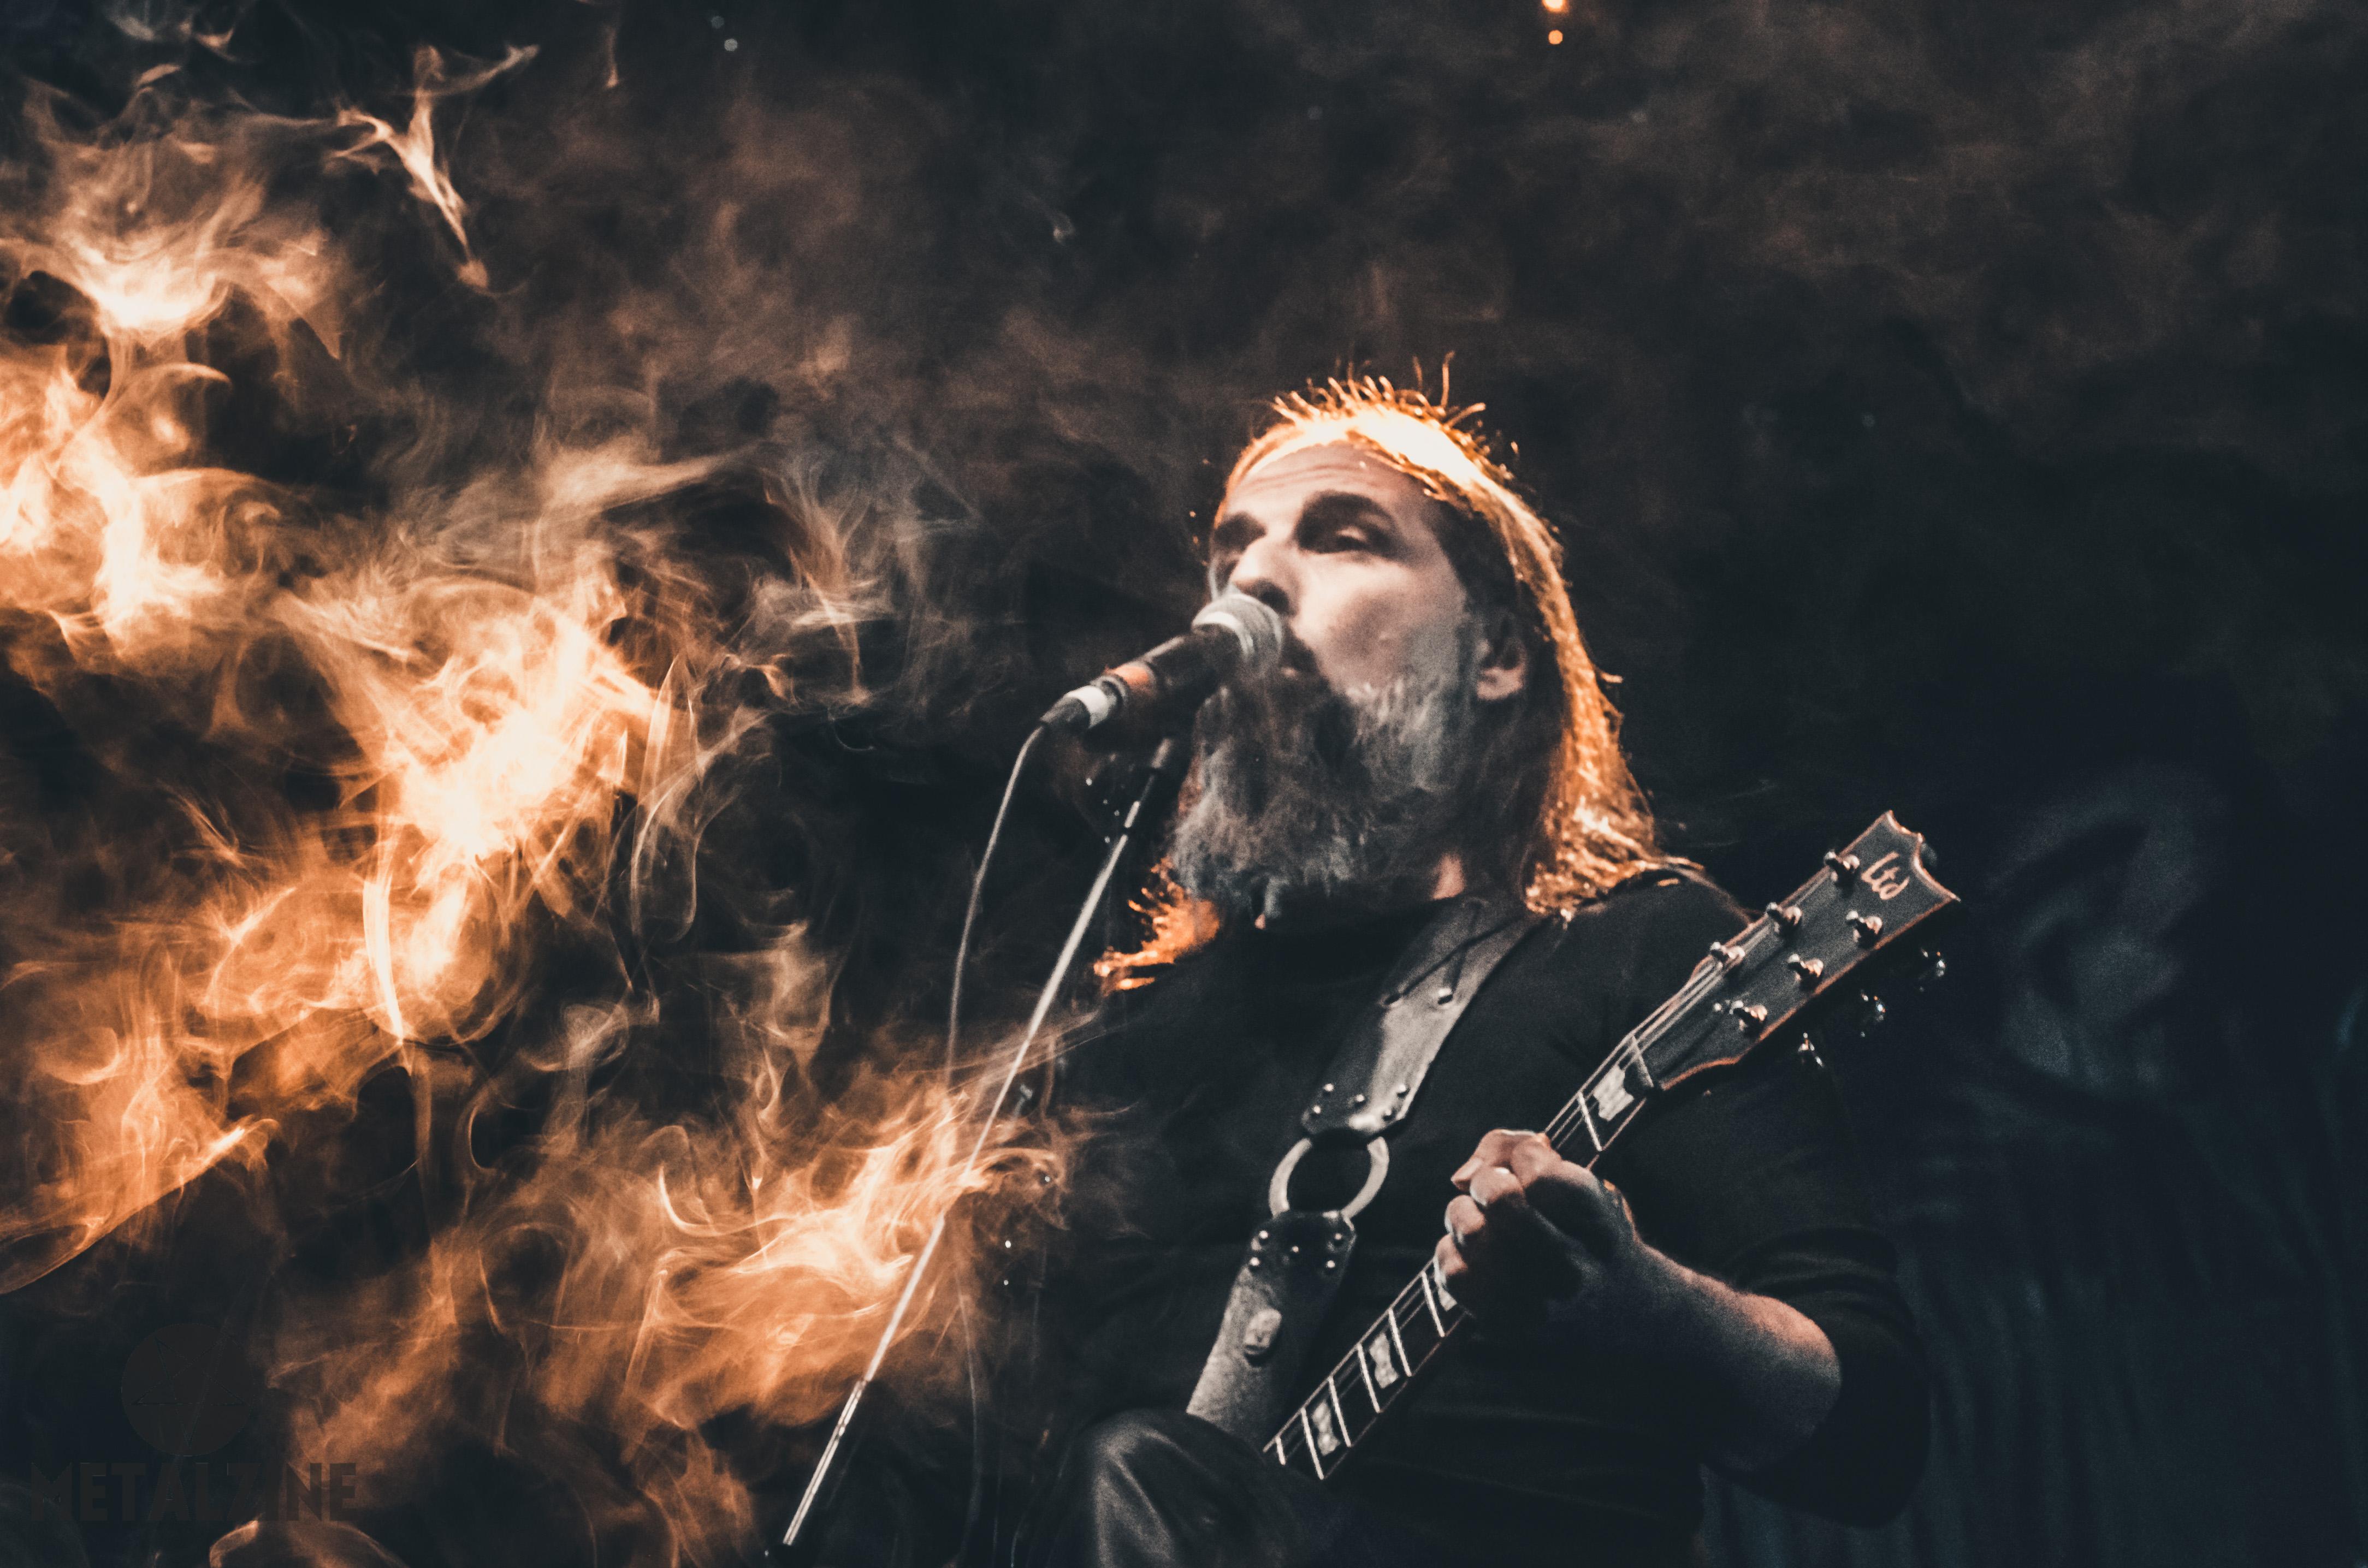 Rotting-Christ-Kyiv2019-67